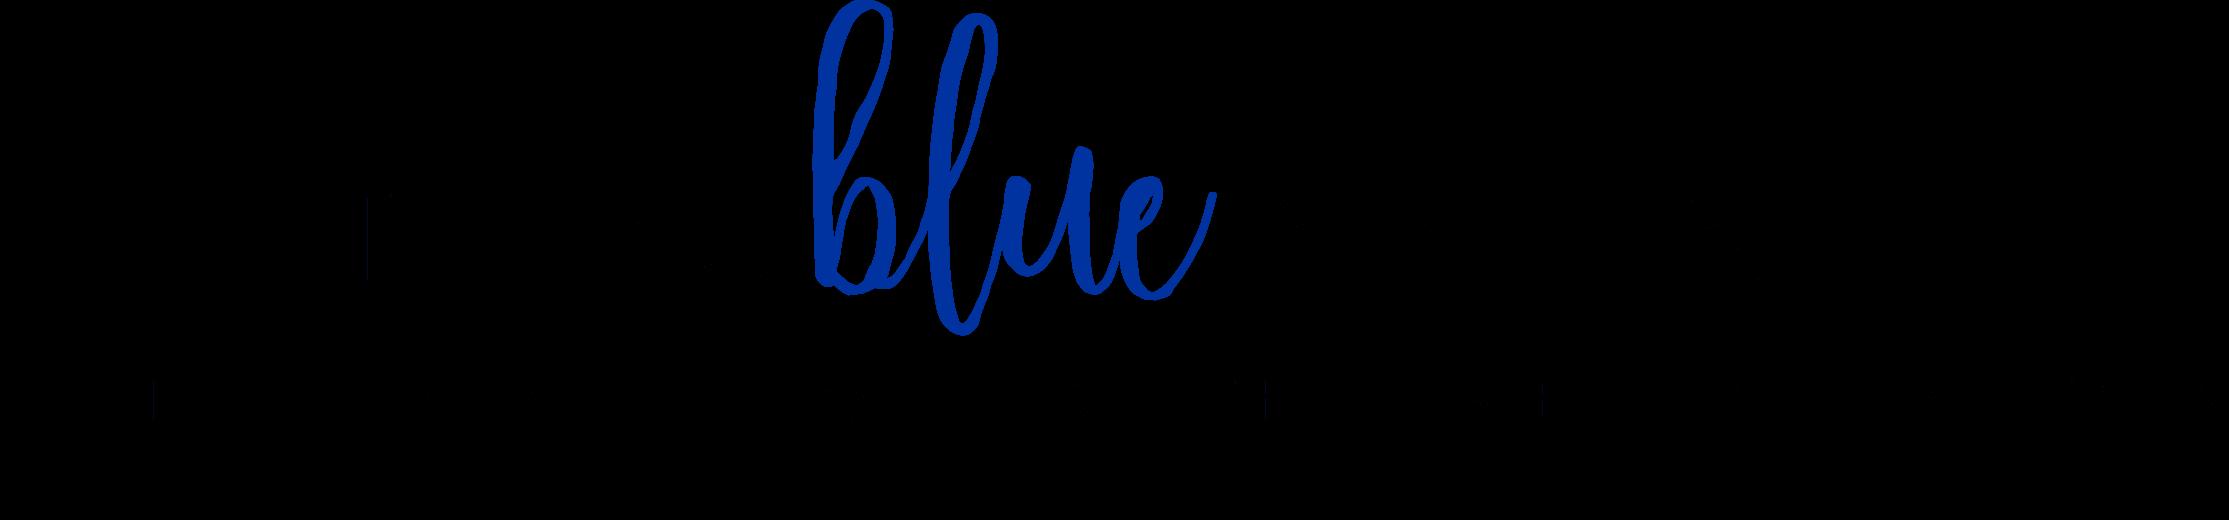 The Big Blue Debutante